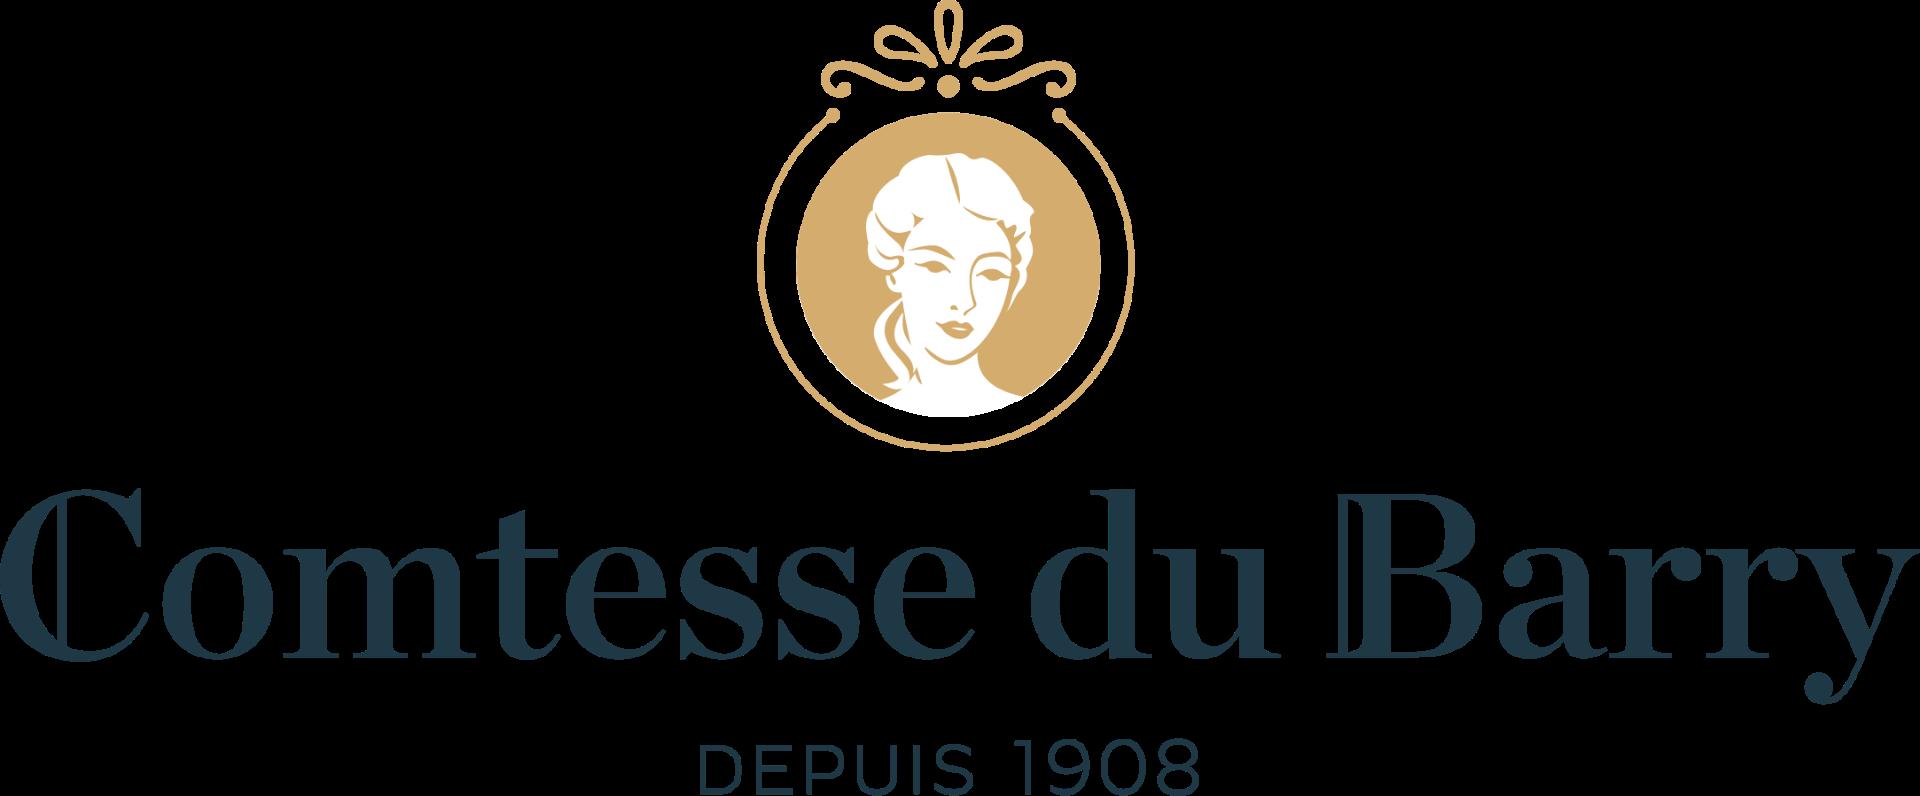 Comtesse du Barry logo